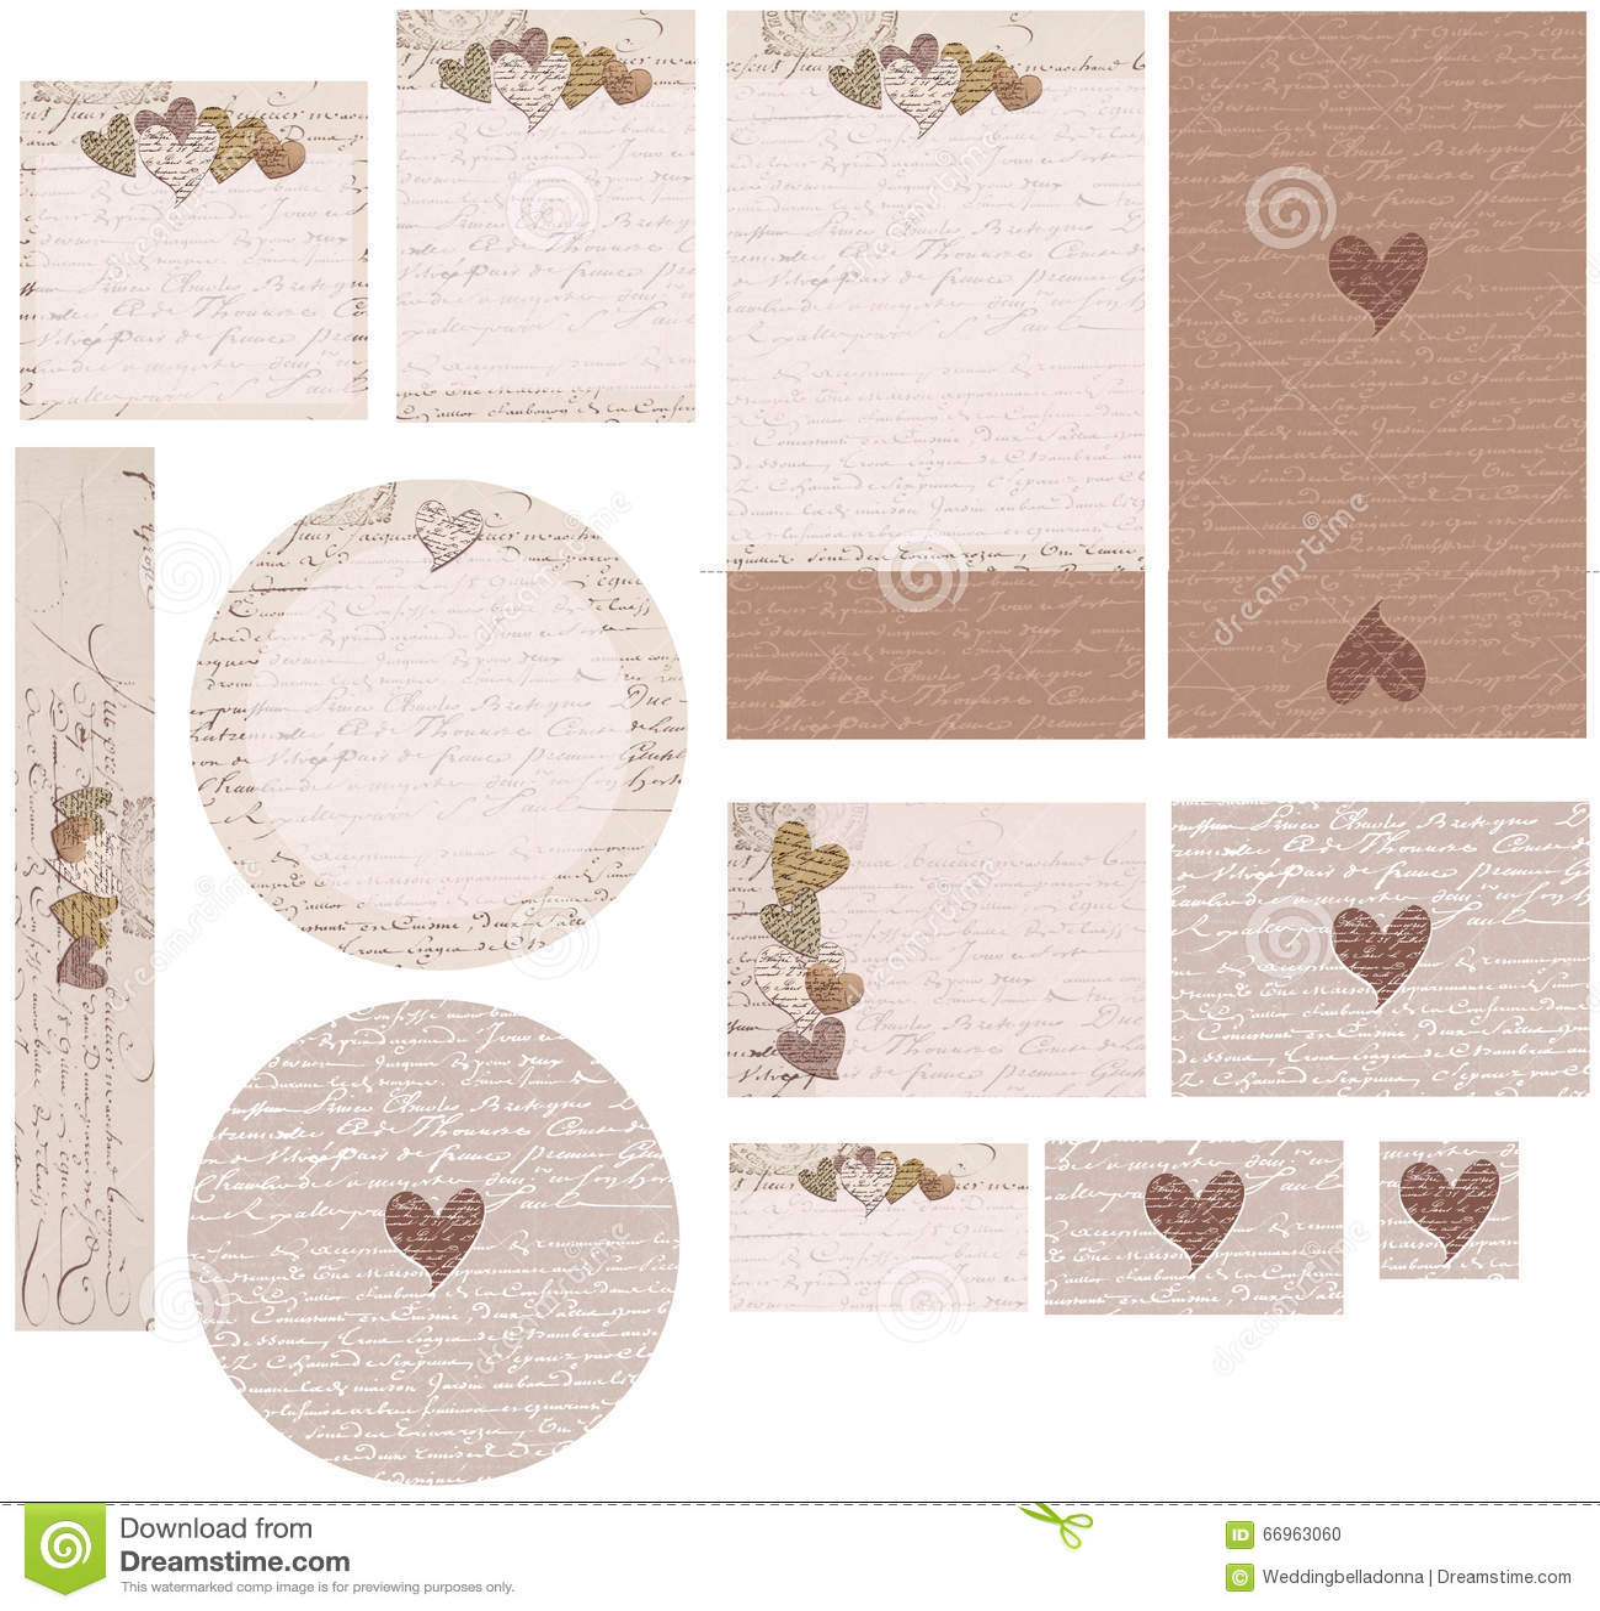 Love Note Hearts Wedding Invitation Set Stock Photo - Image of